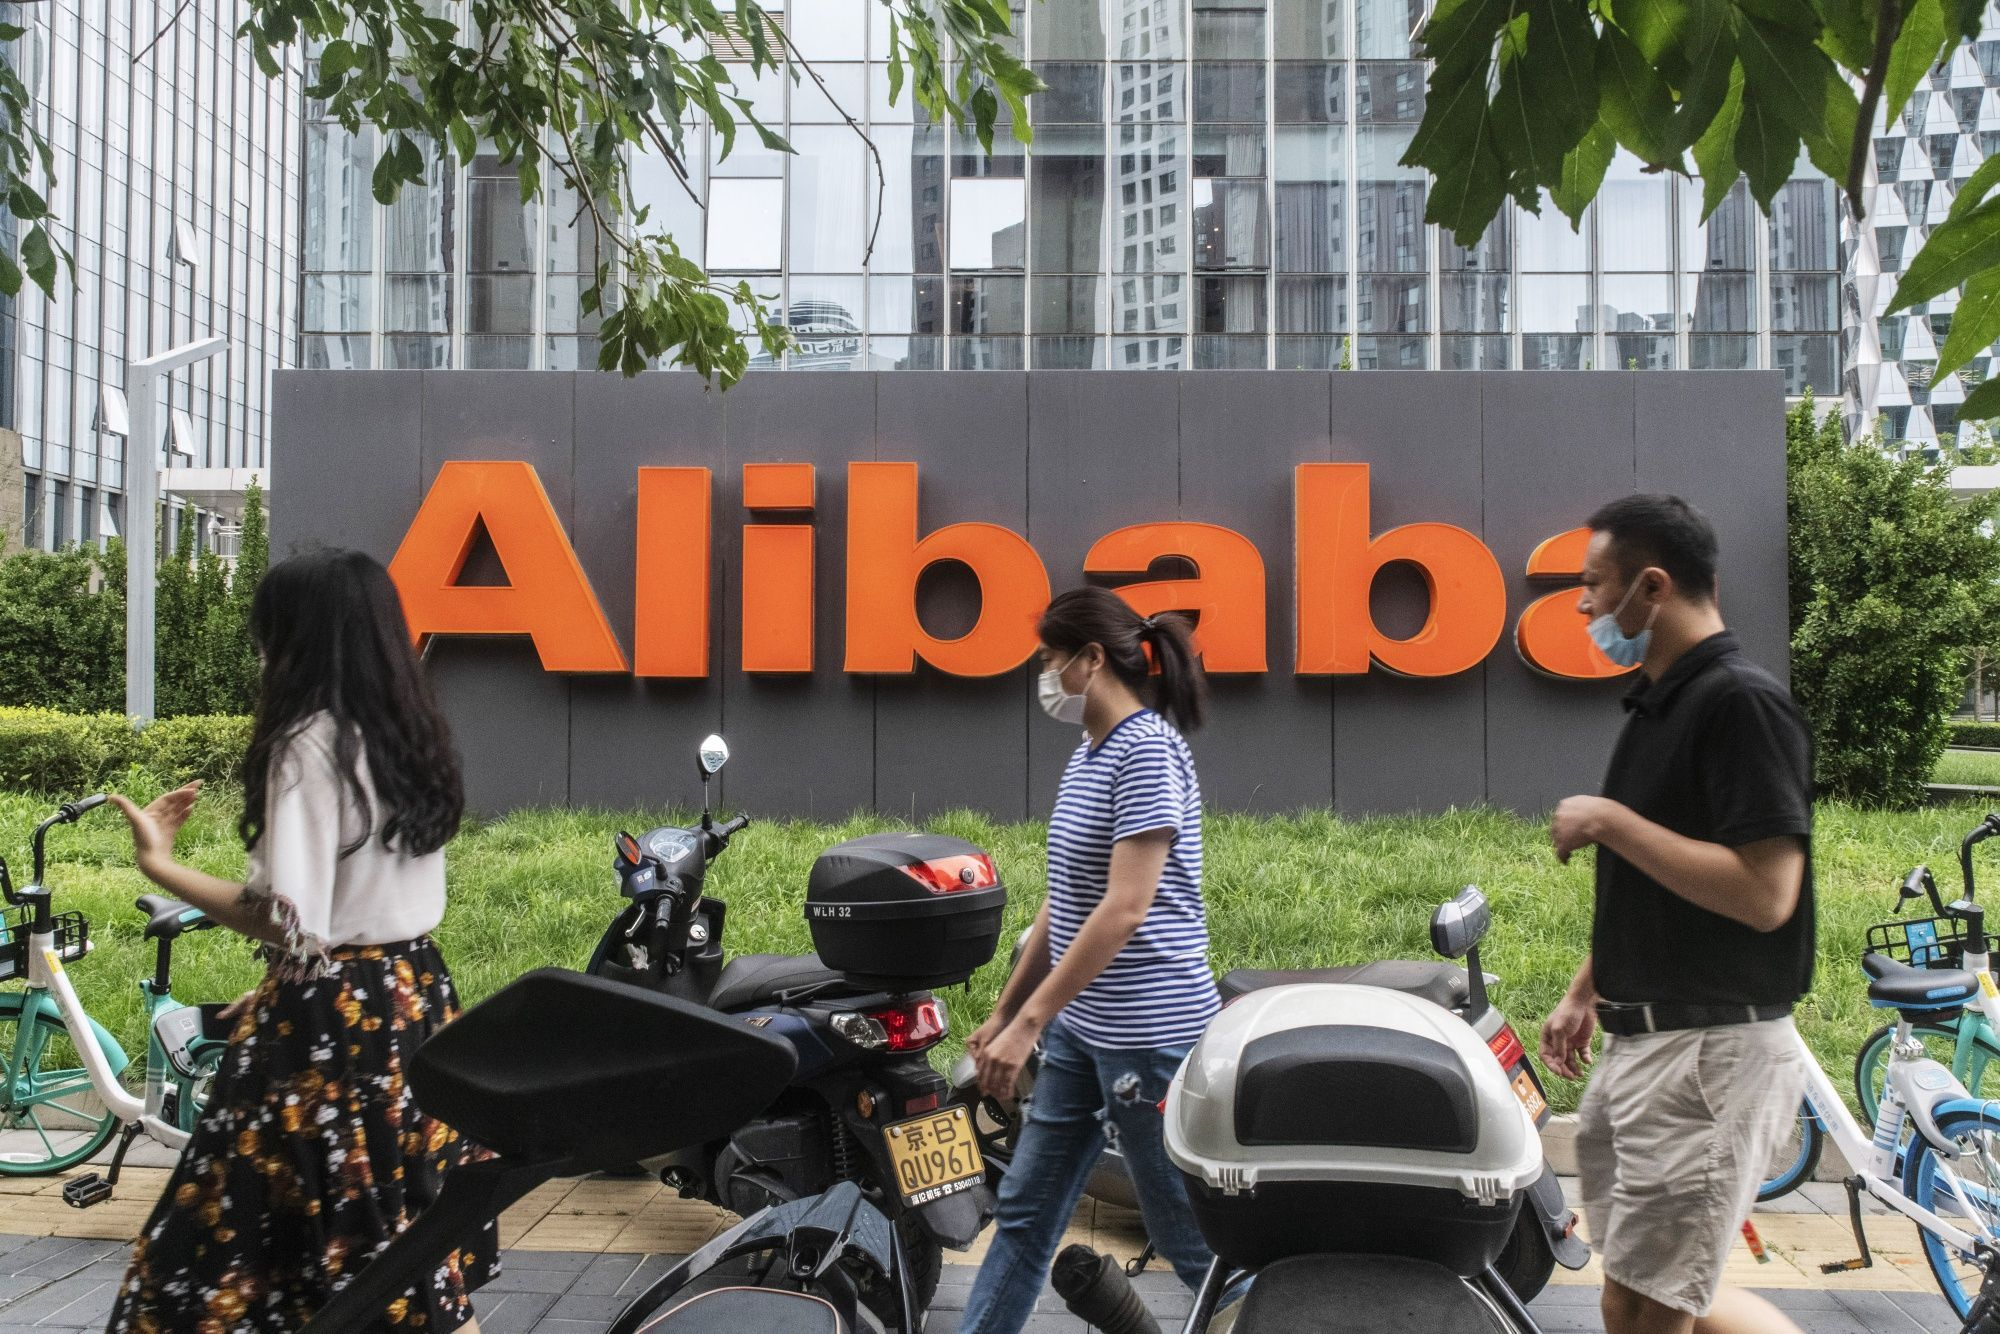 Alibab - جریمه ی Alibaba نشانه ی سختگیری چین در بخش فناوریست